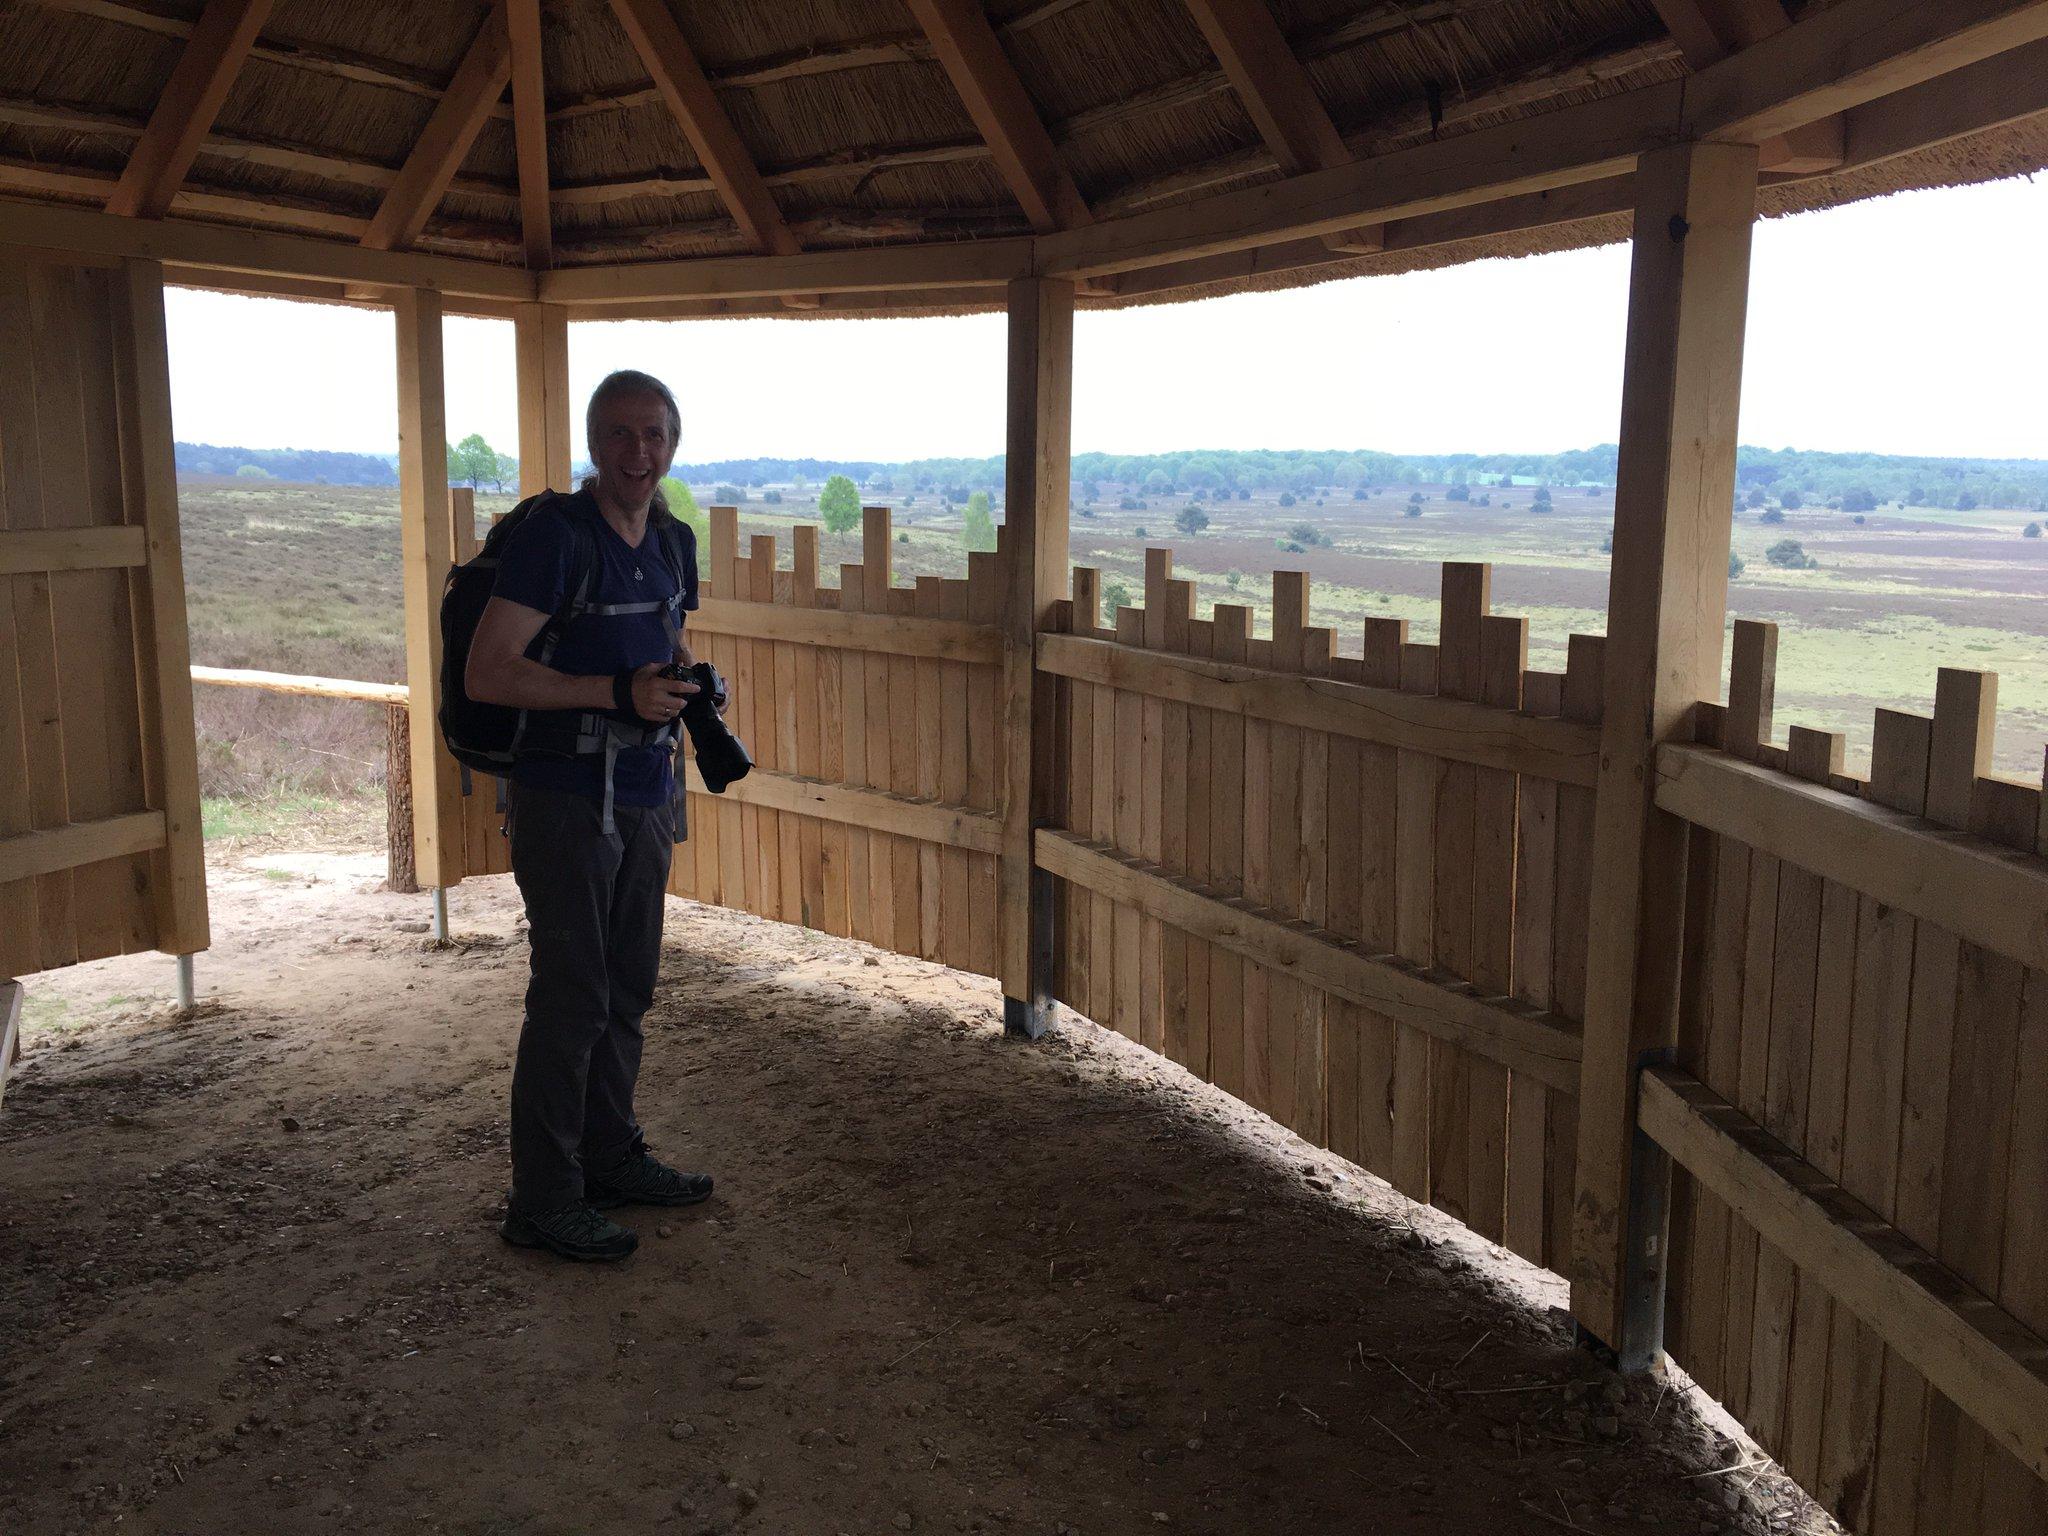 Schutzhütte mit weitem Ausblick #meurers #heidebloggerevent #meinbispingen https://t.co/TRjhezTsMZ